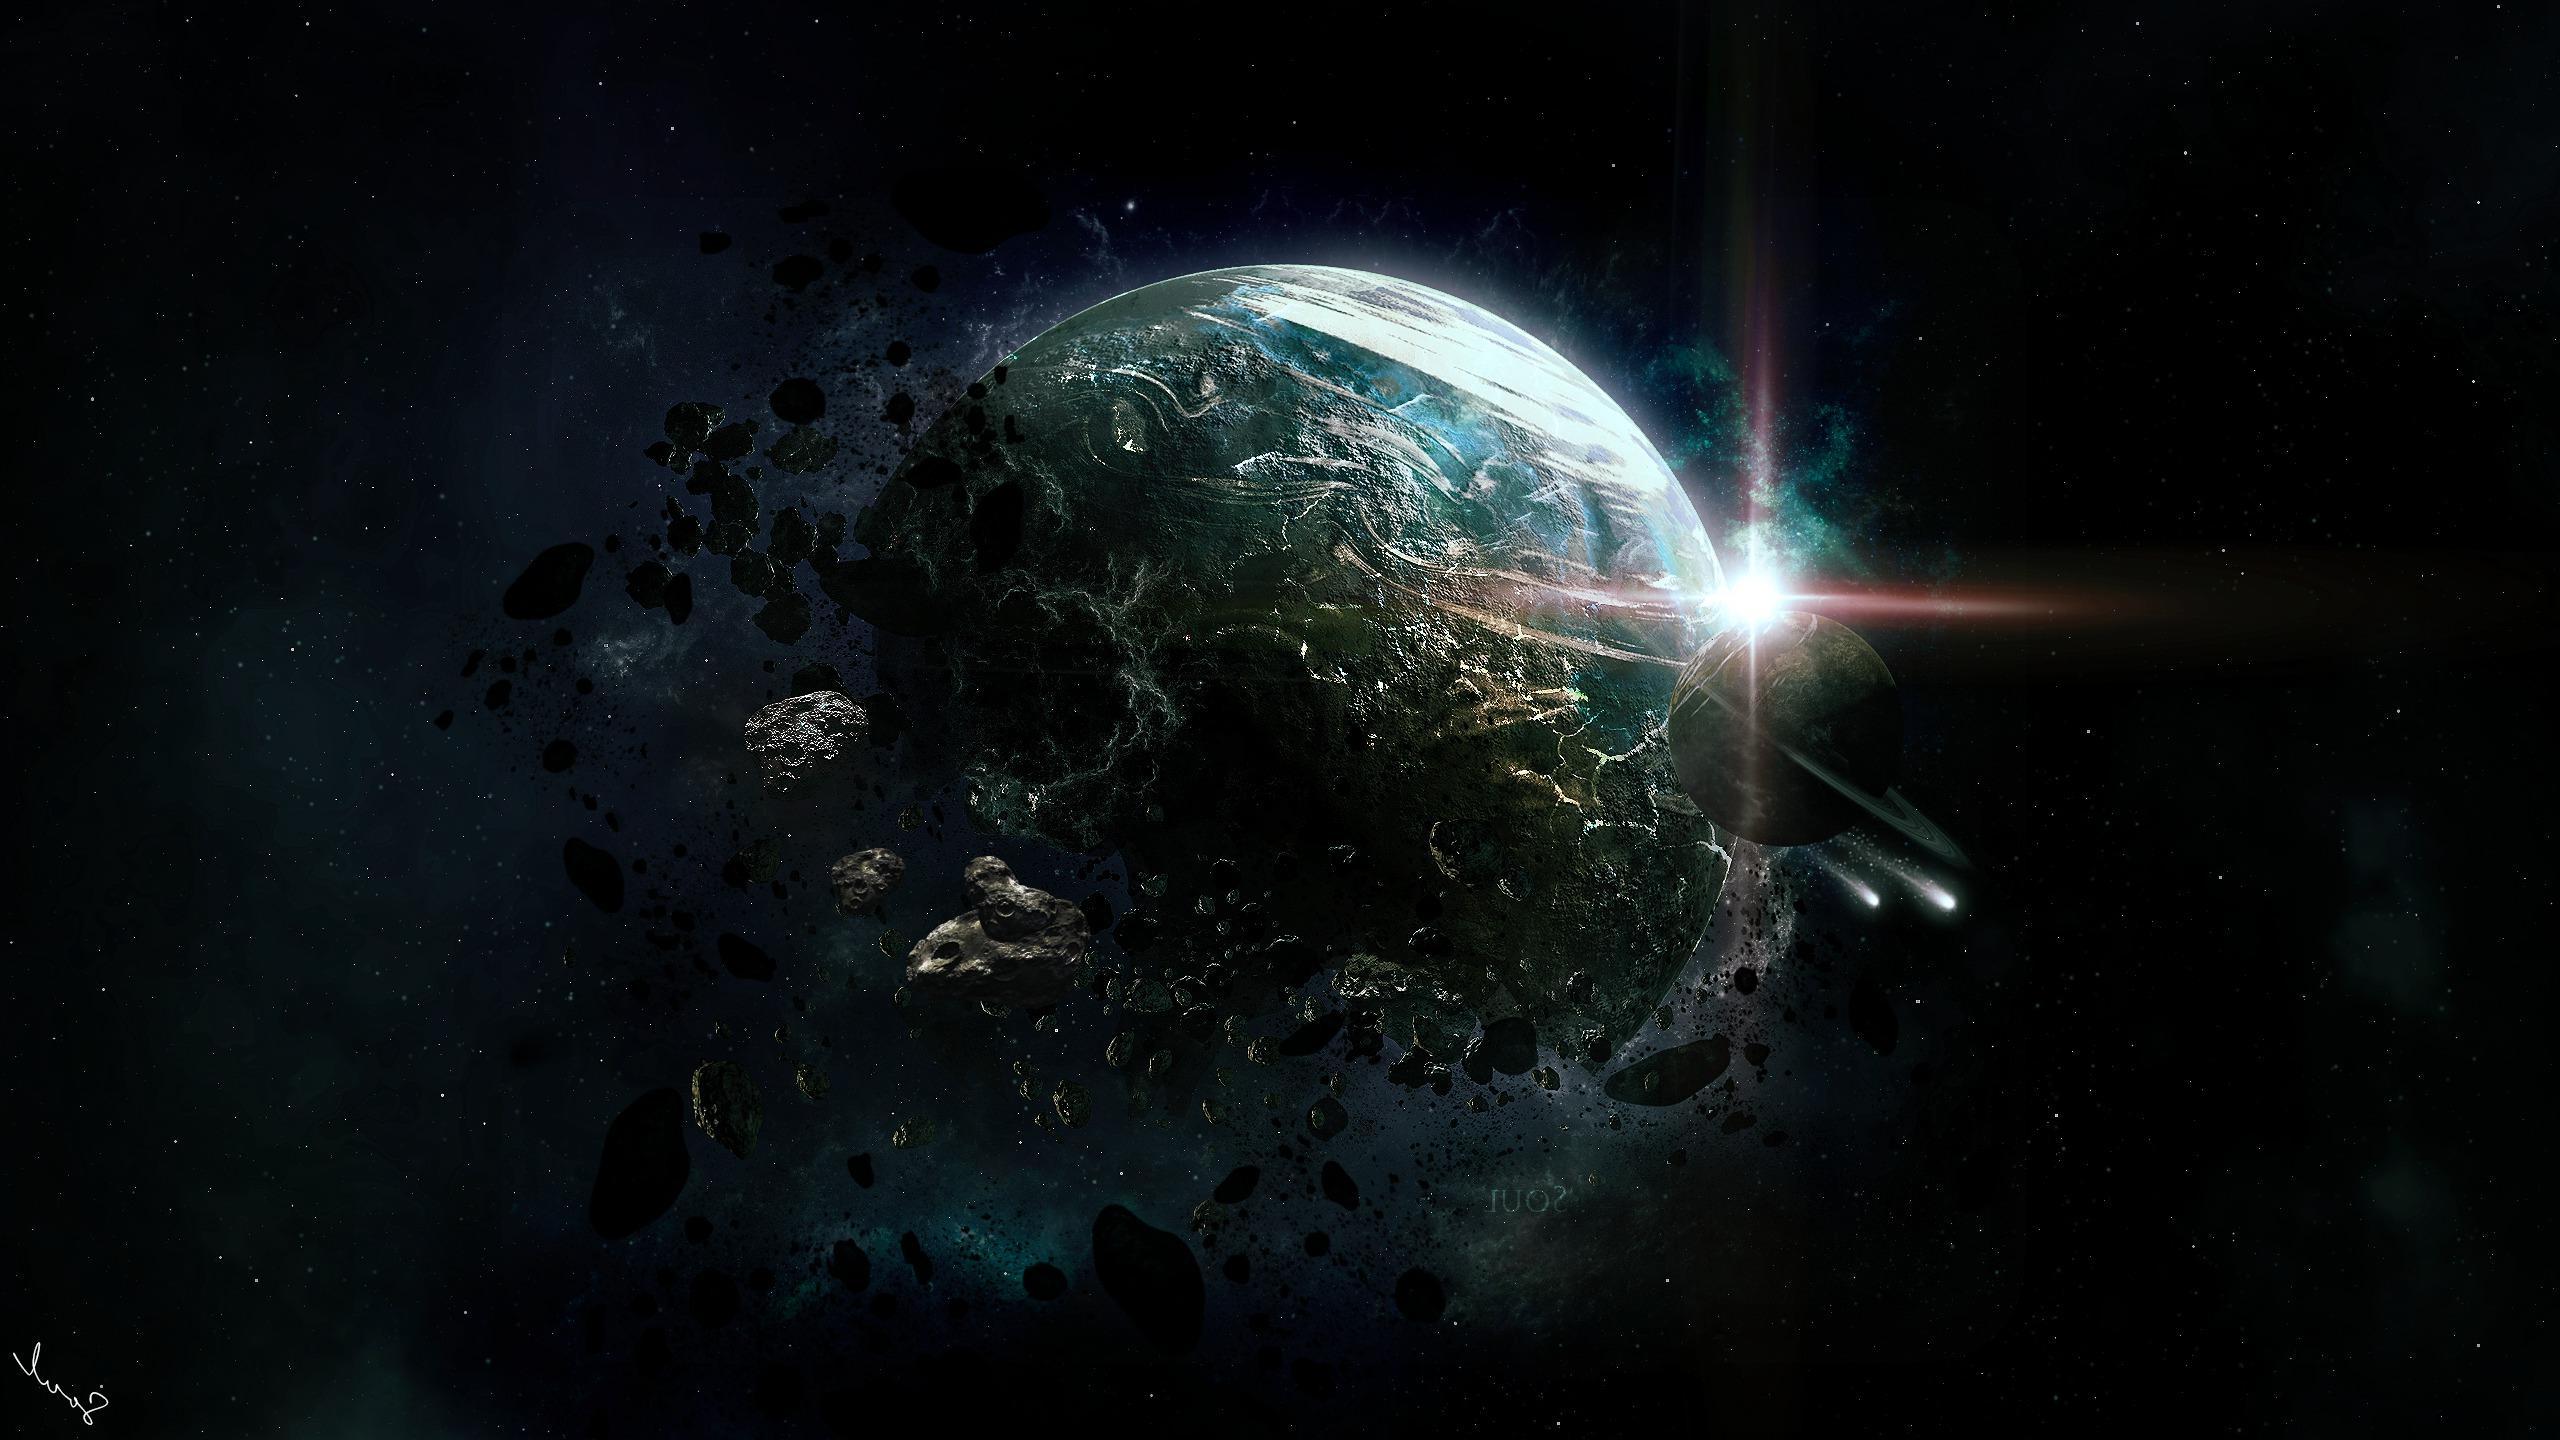 Sci Fi Wallpaper 2560x1440: Wallpaper : 2560x1440 Px, Apocalyptic, ART, Asteroids